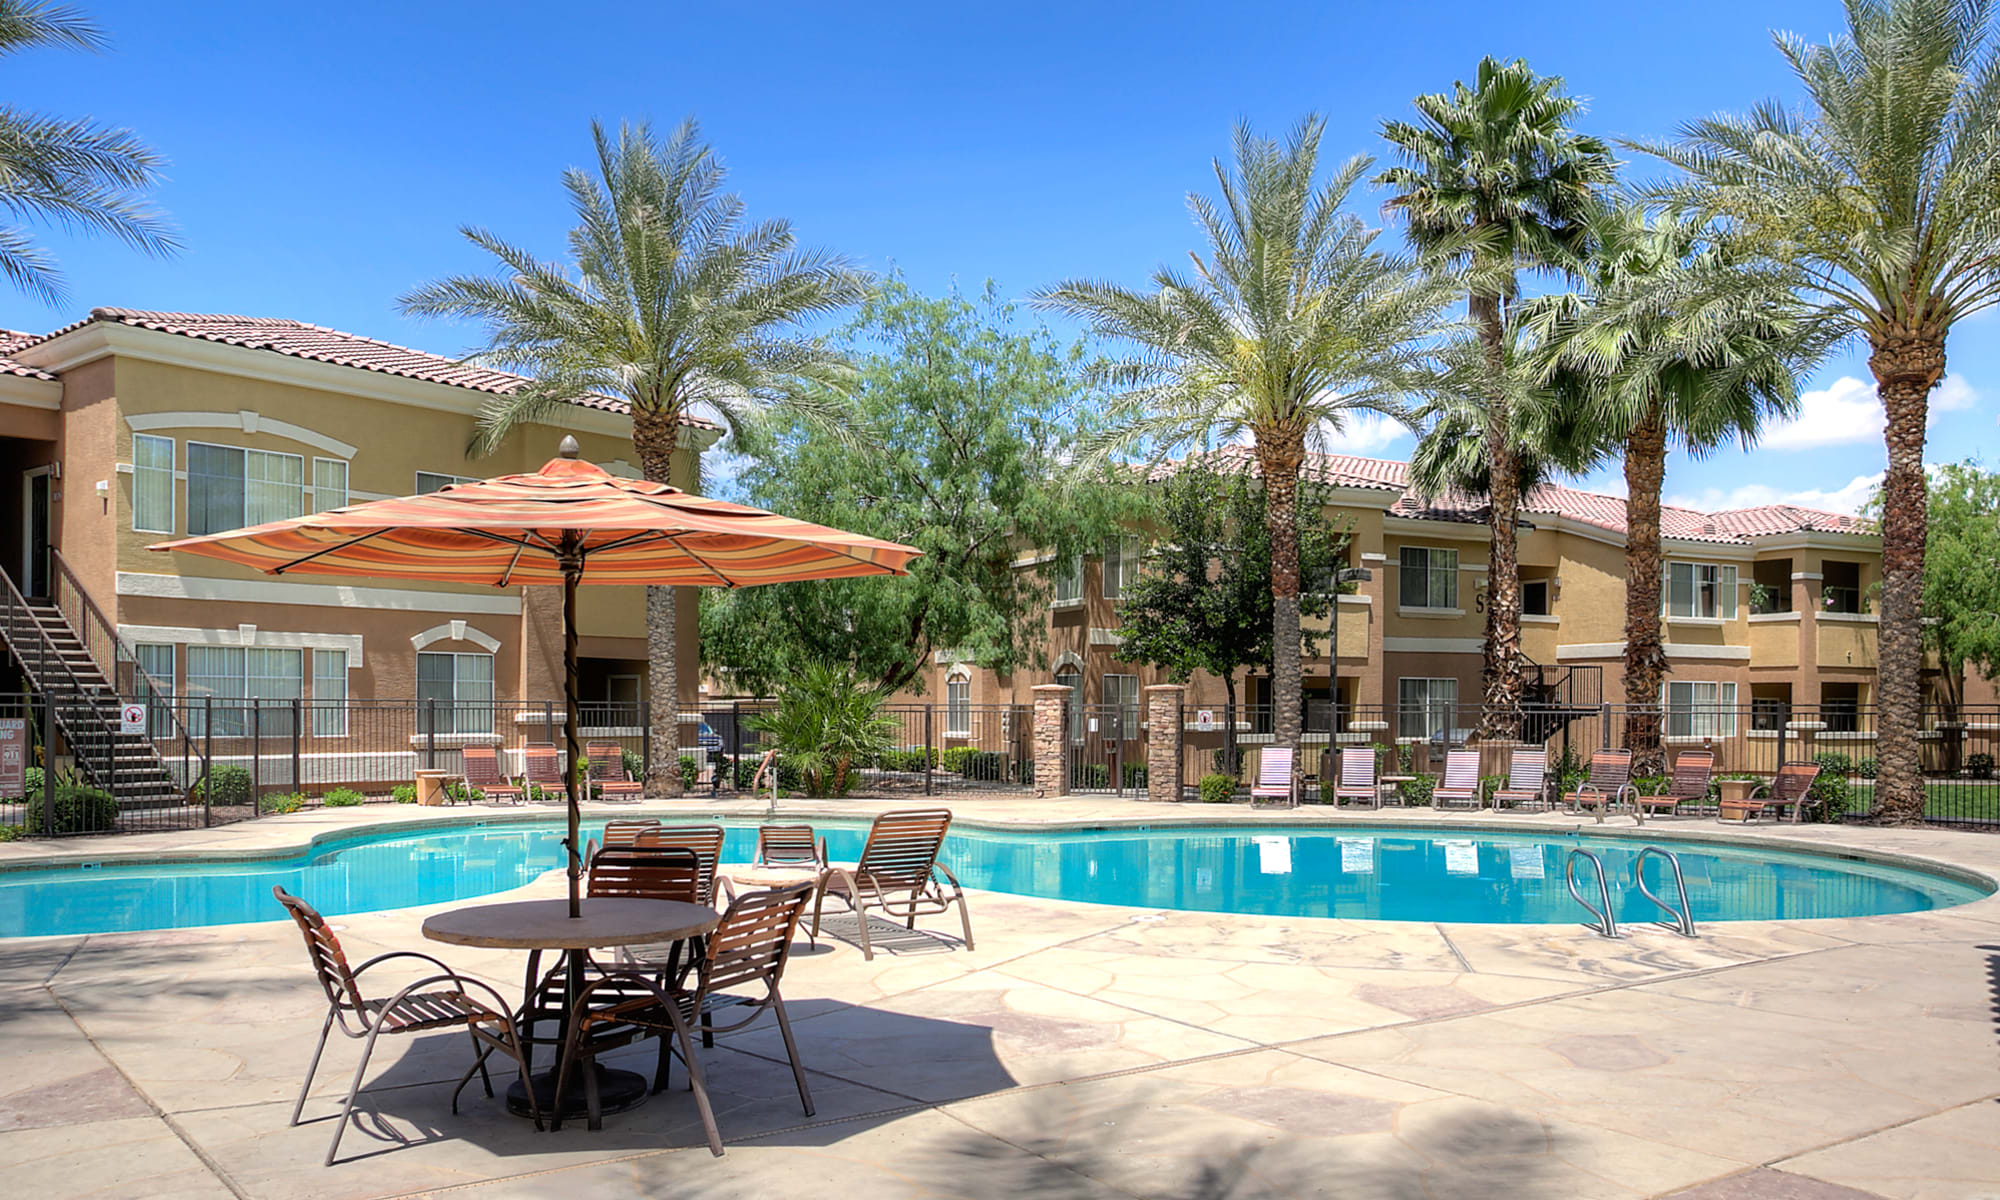 Apartments at Remington Ranch in Litchfield Park, Arizona